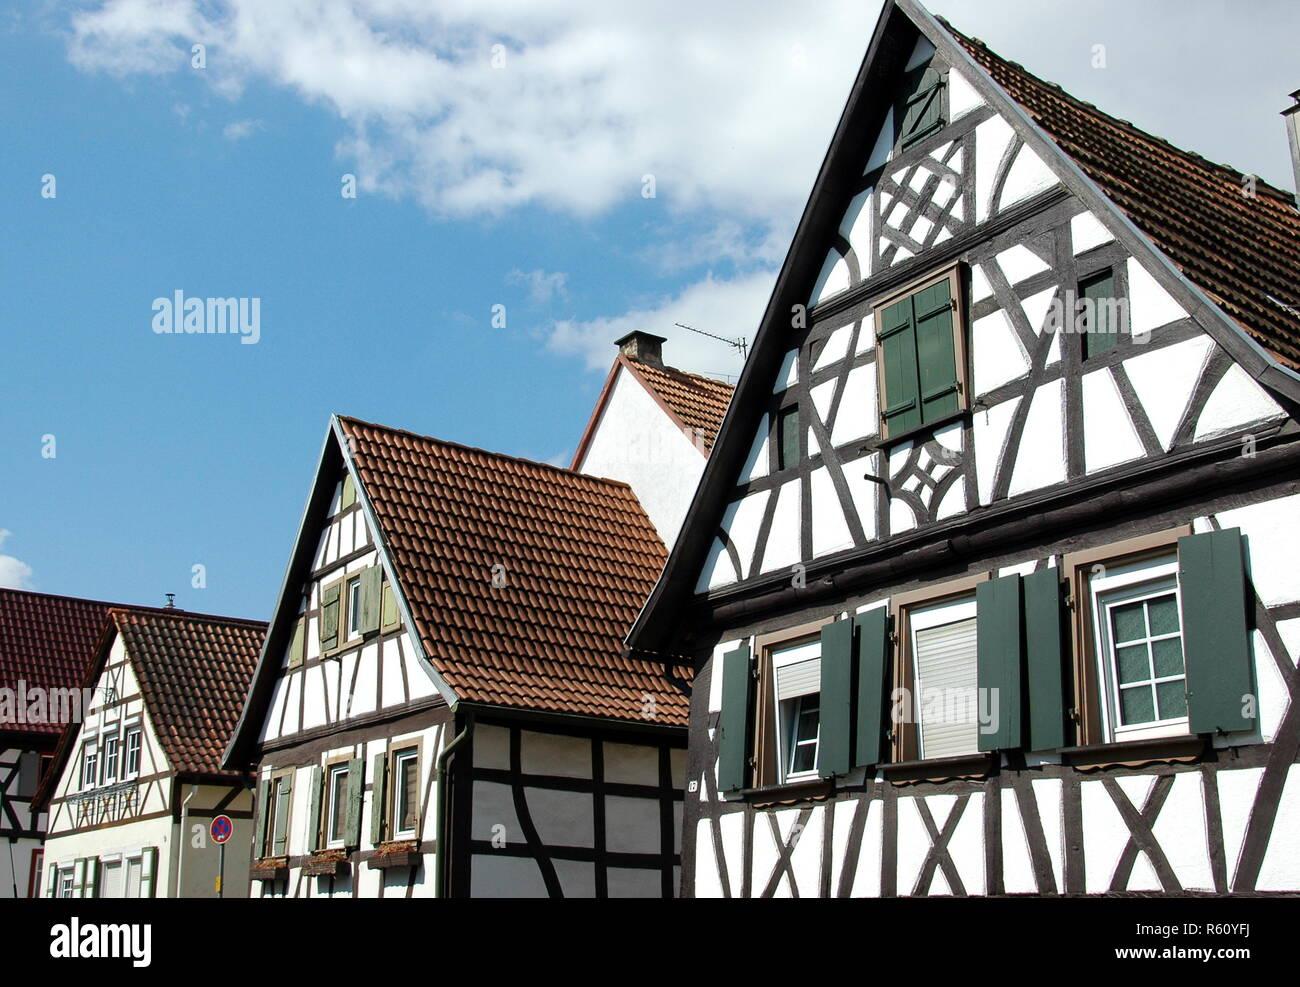 half-timbered houses badgasse rheinzabern Stock Photo